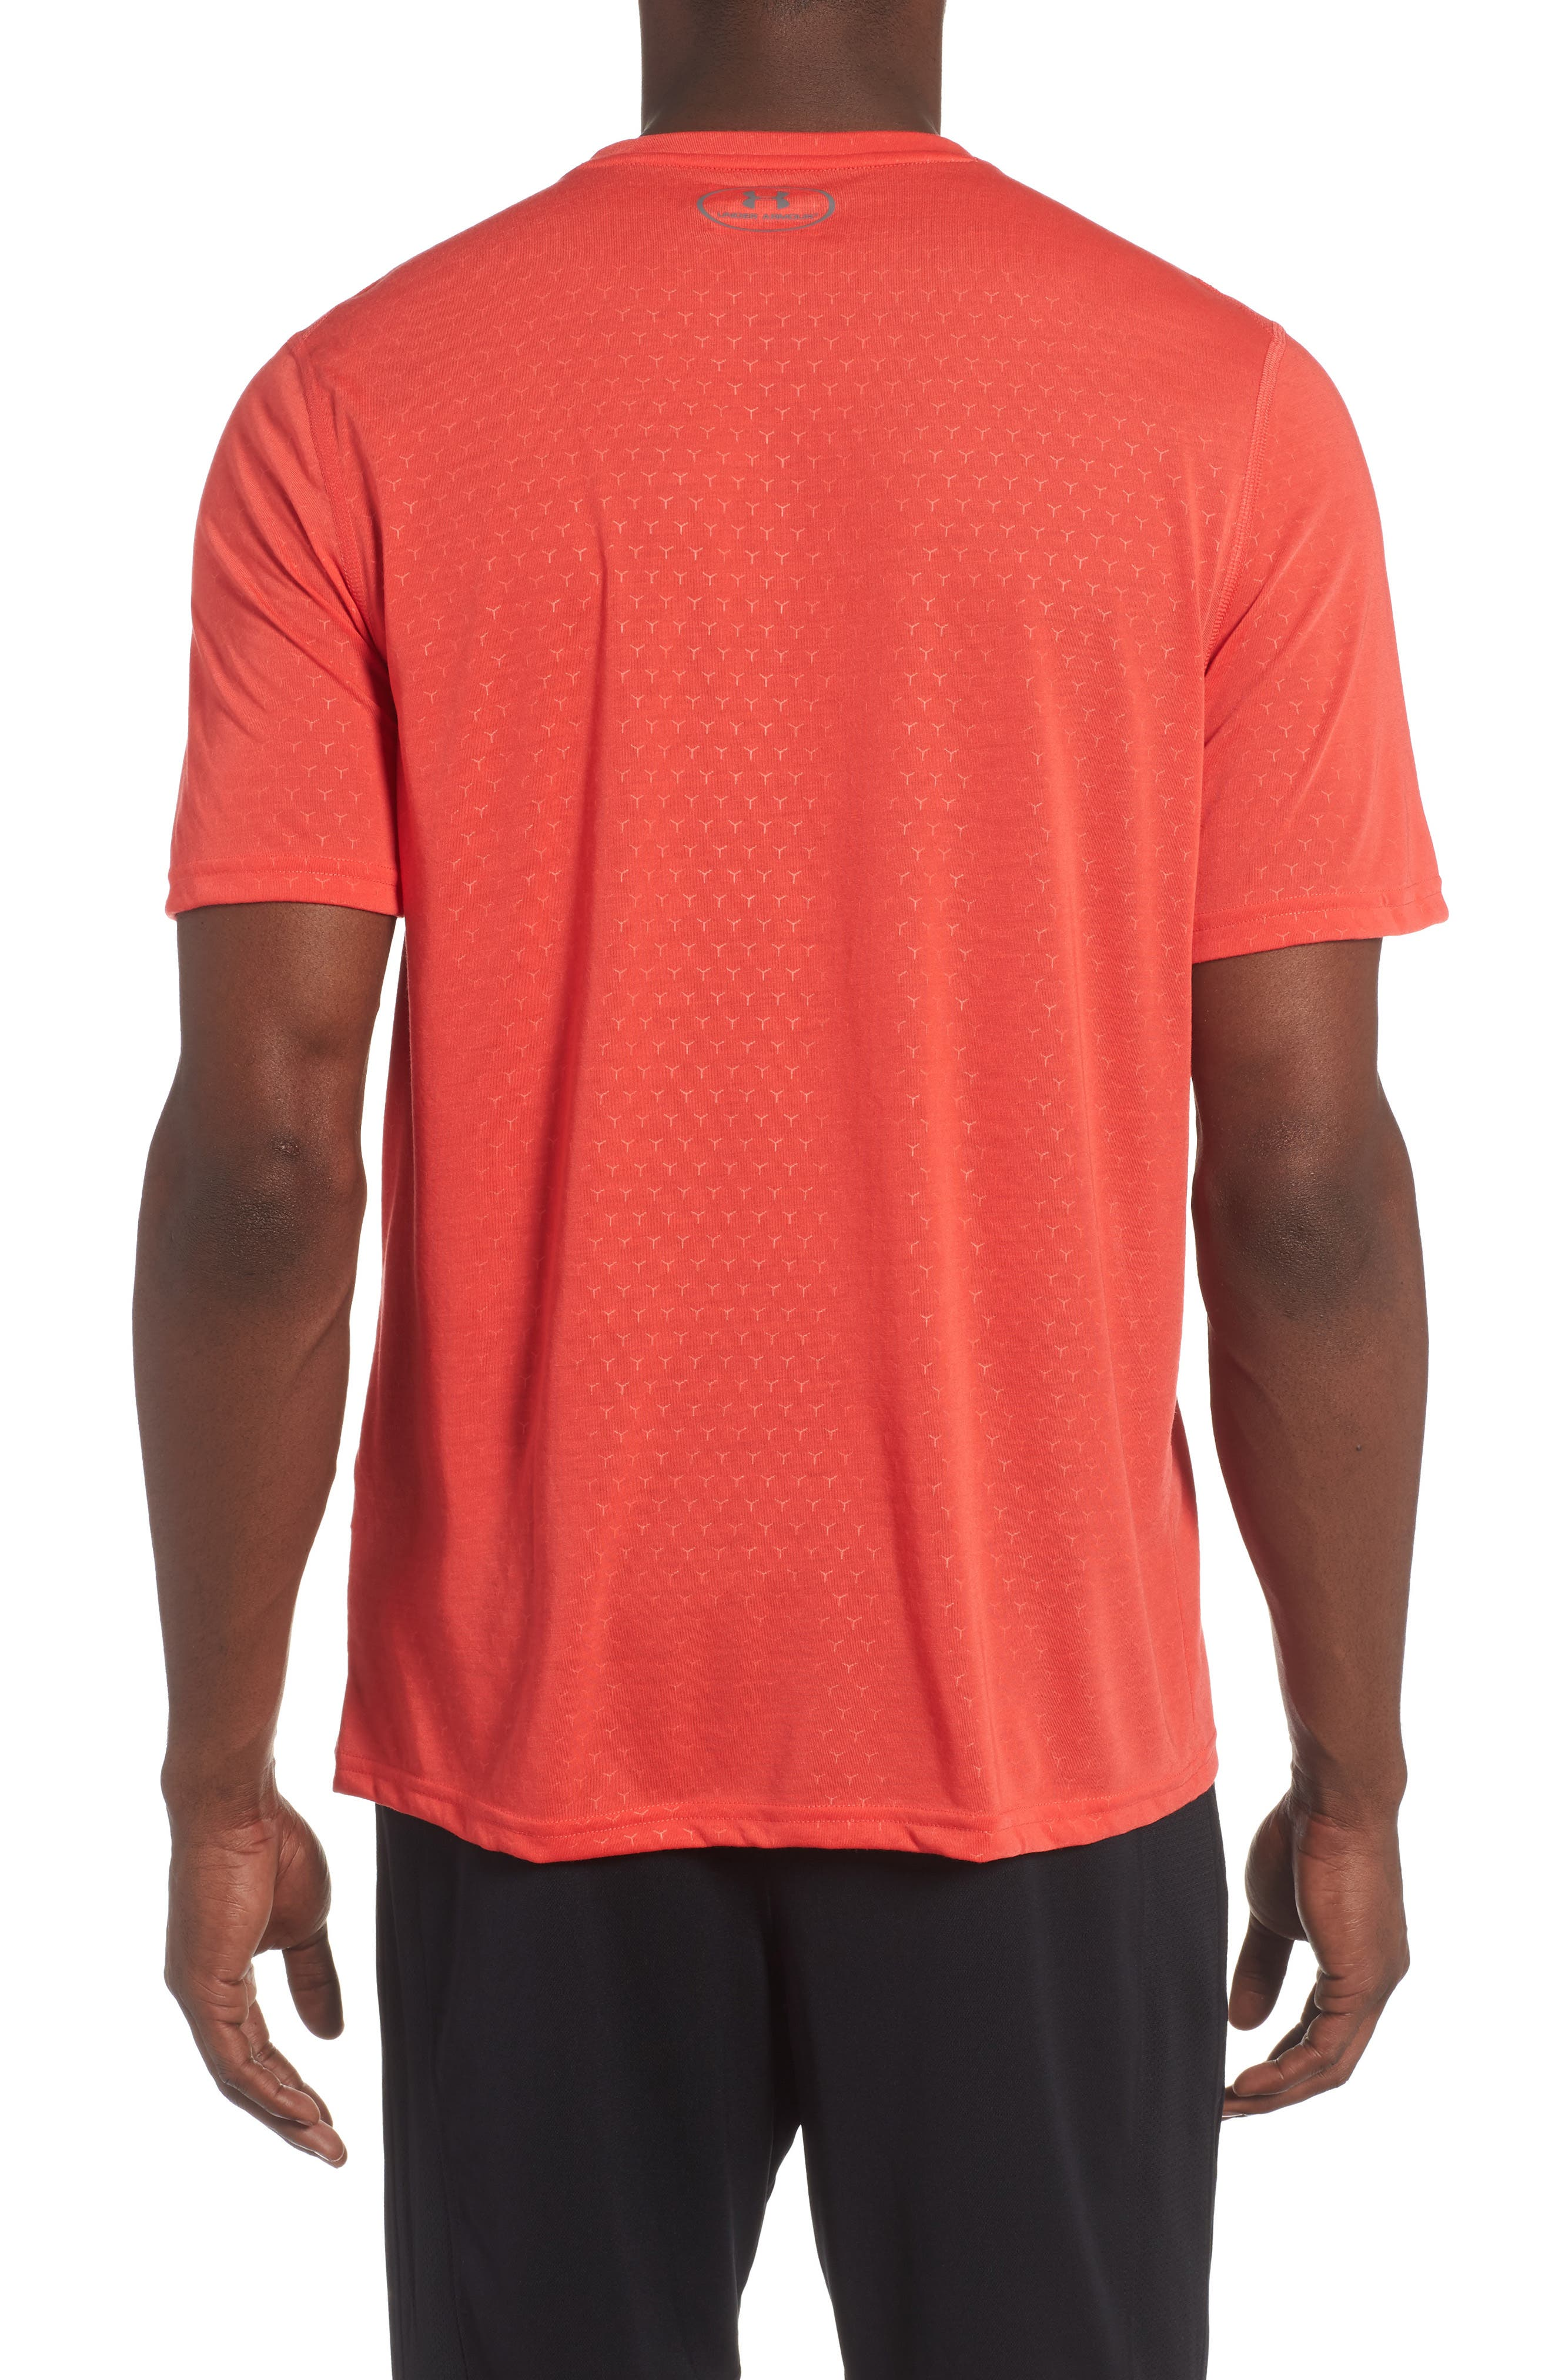 Alternate Image 2  - Under Armour Threadborne Siro Regular Fit T-Shirt